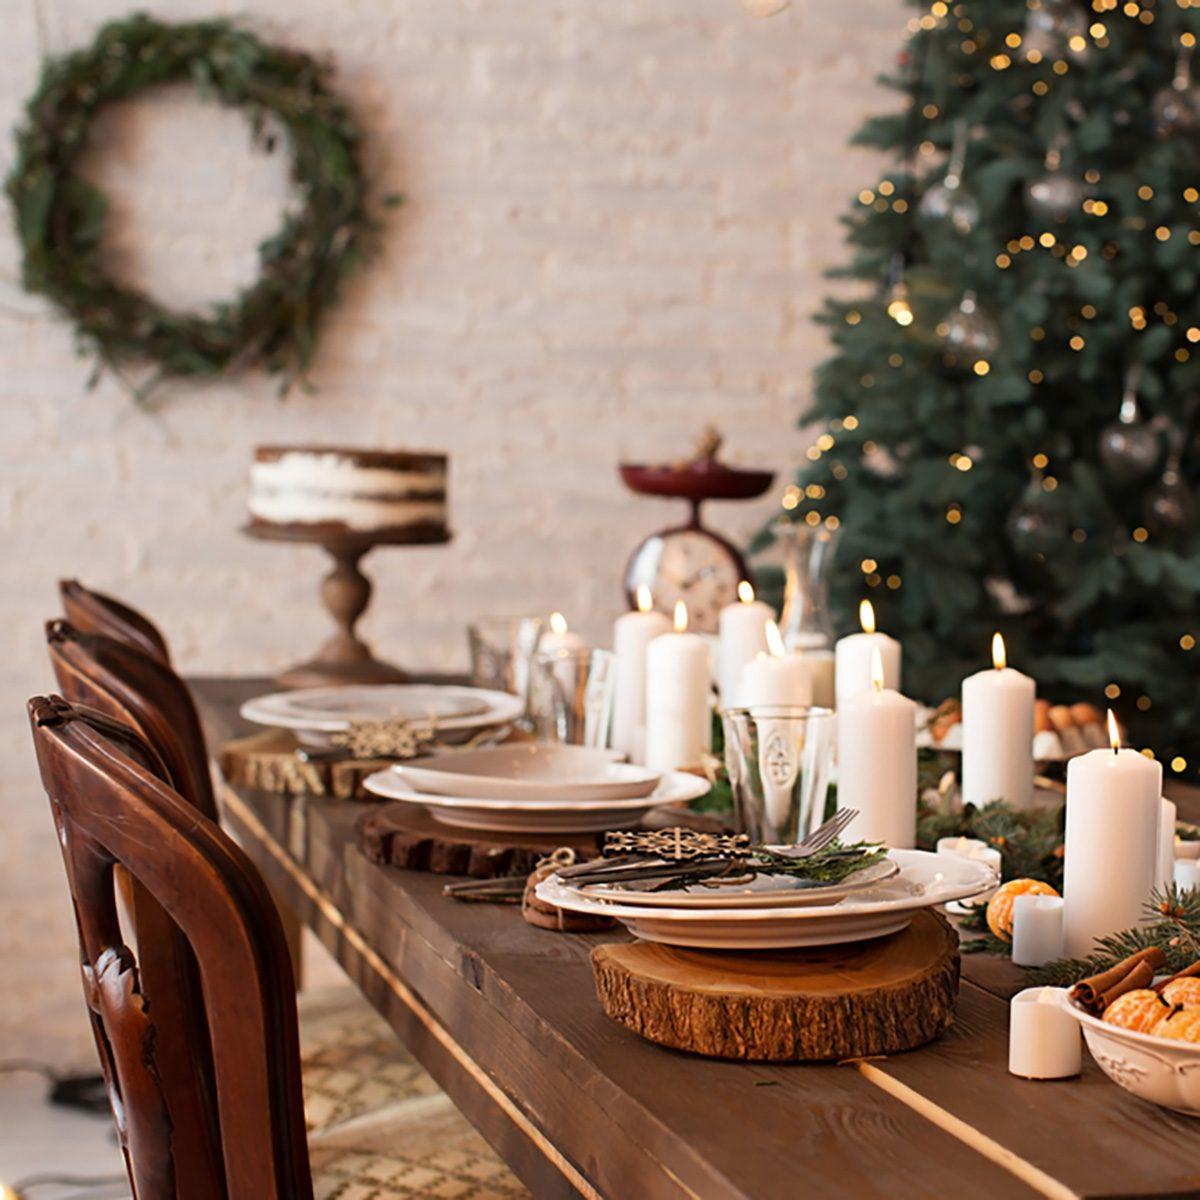 10 Secrets for a Stress-Free Christmas Dinner | Taste of Home